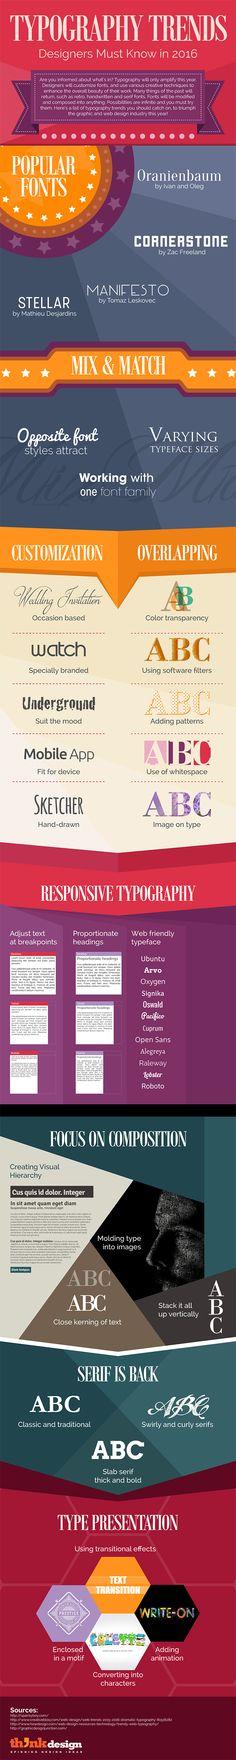 Typografie und Fonts-Trends 2016 #Typography Trends Designers Must Know